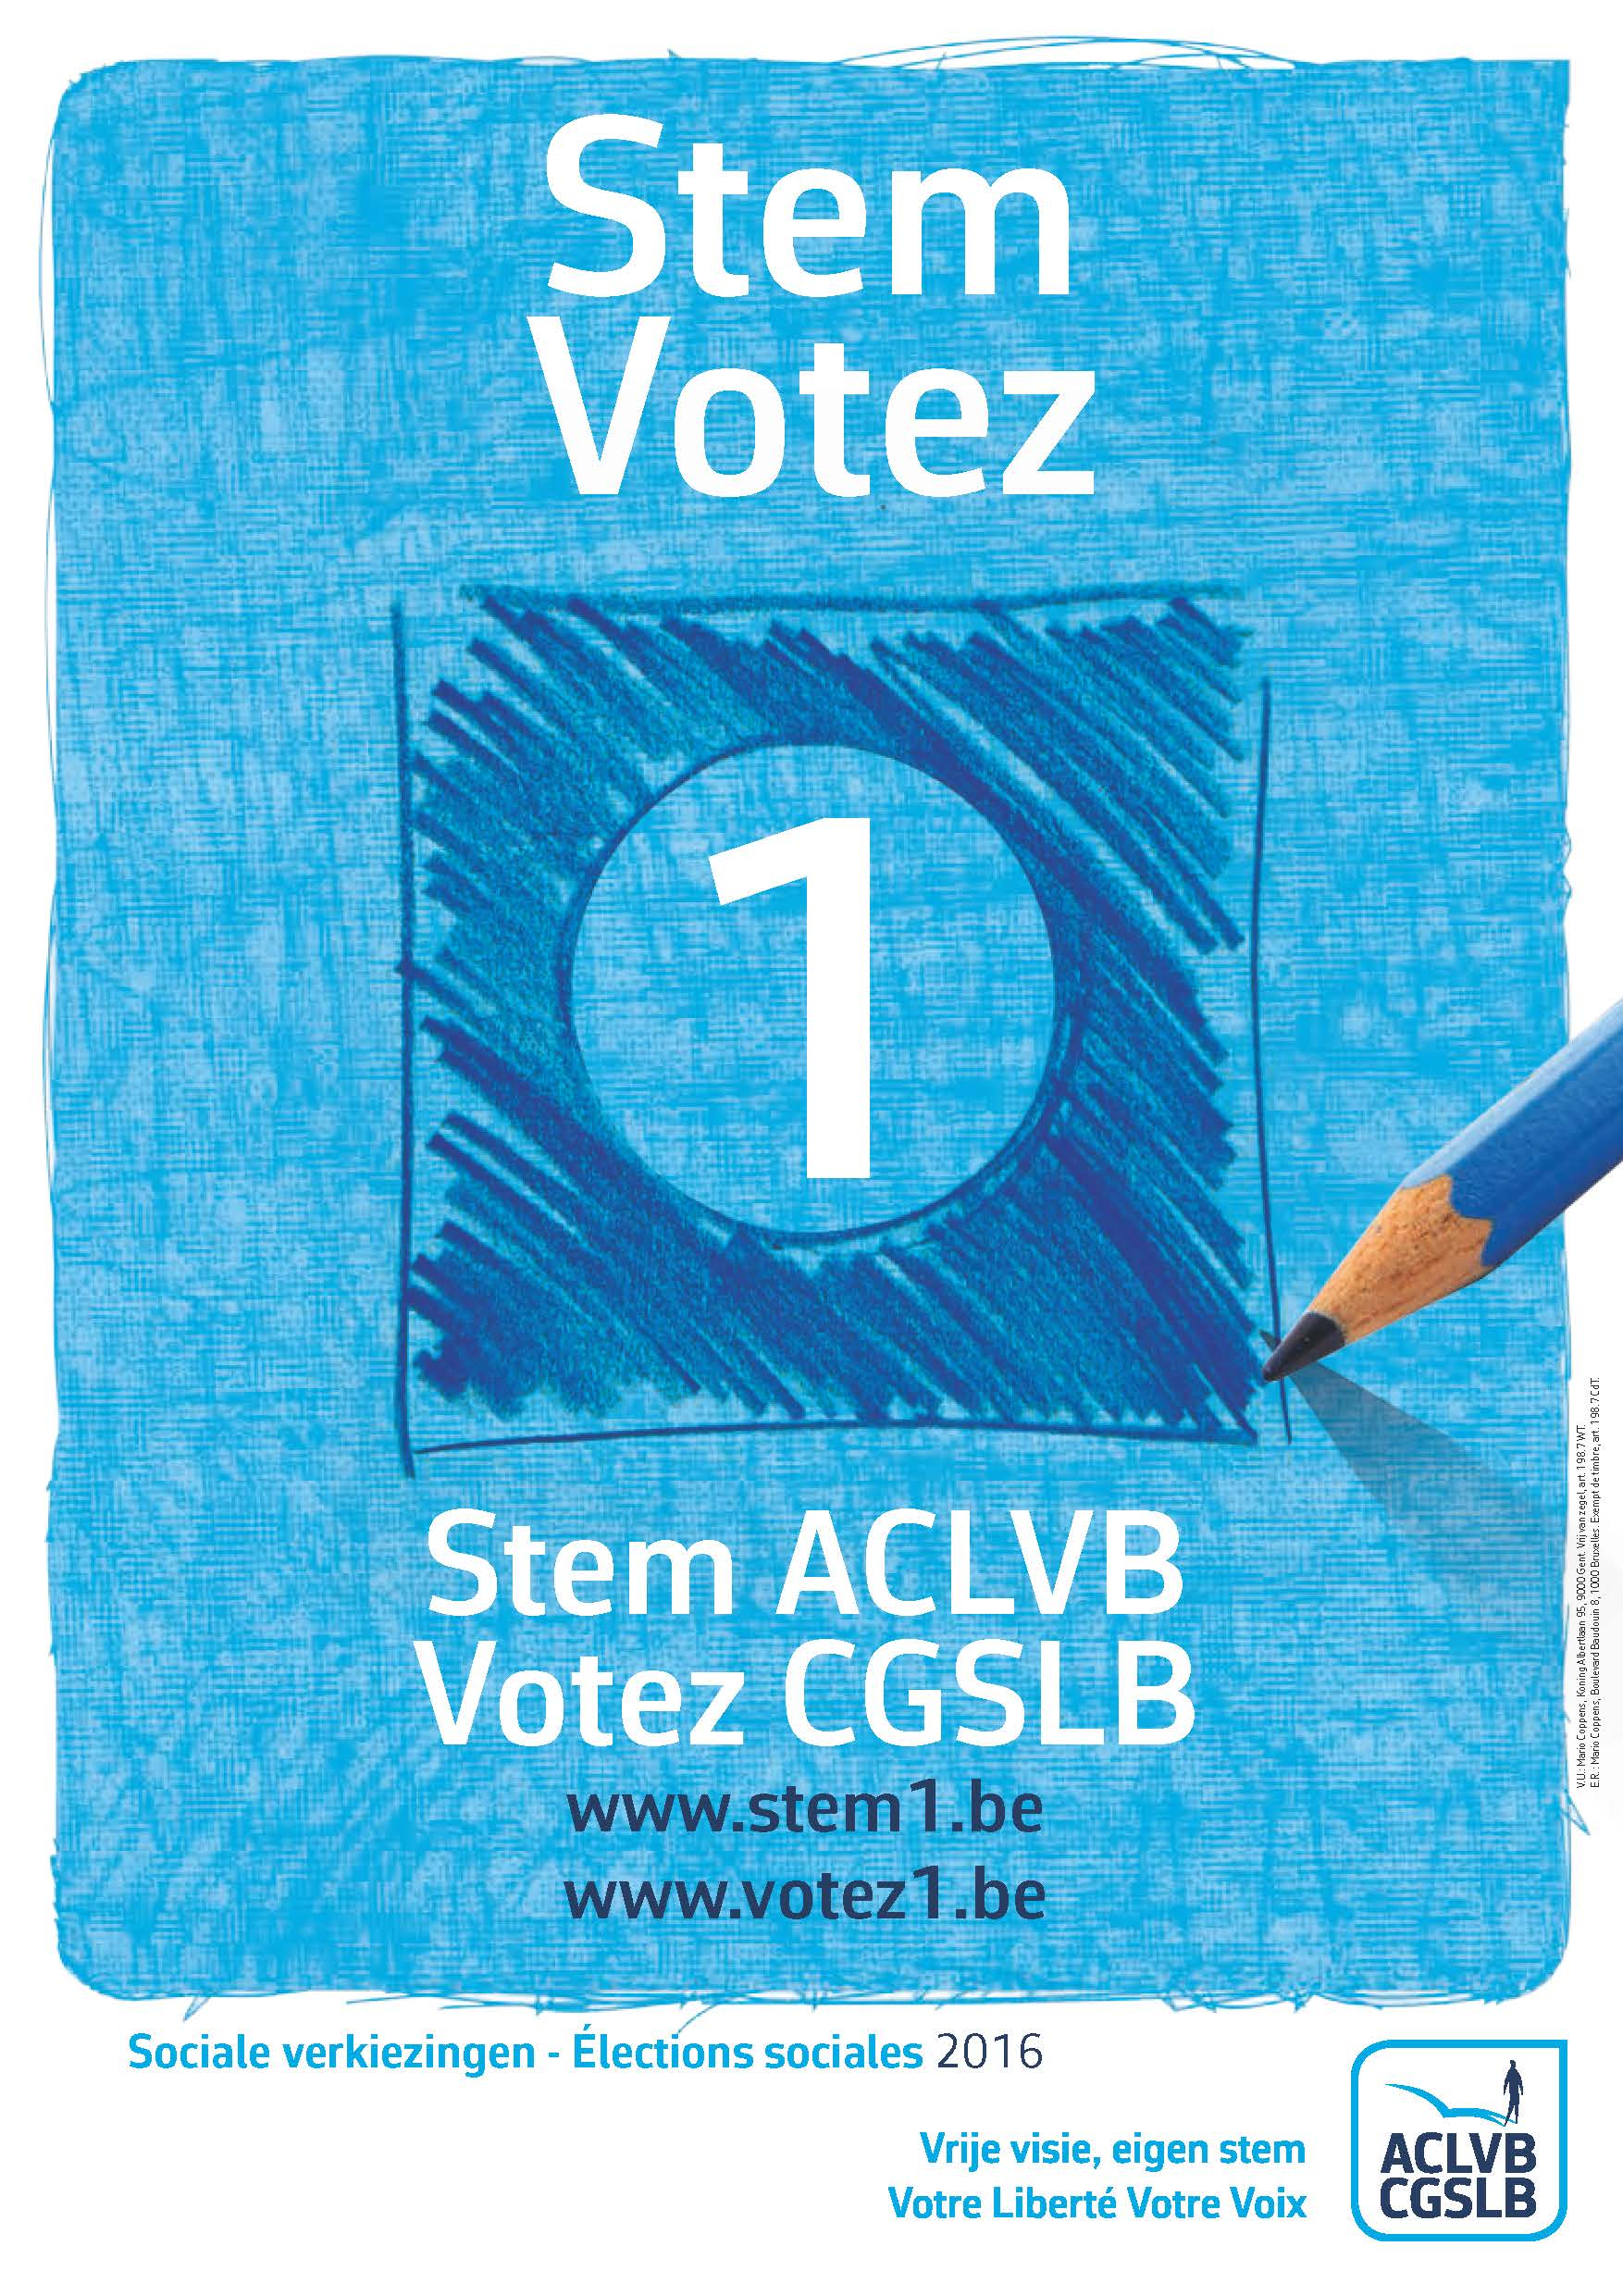 aclvb-so1987-affiches-stem1-nlfr-lores.jpg